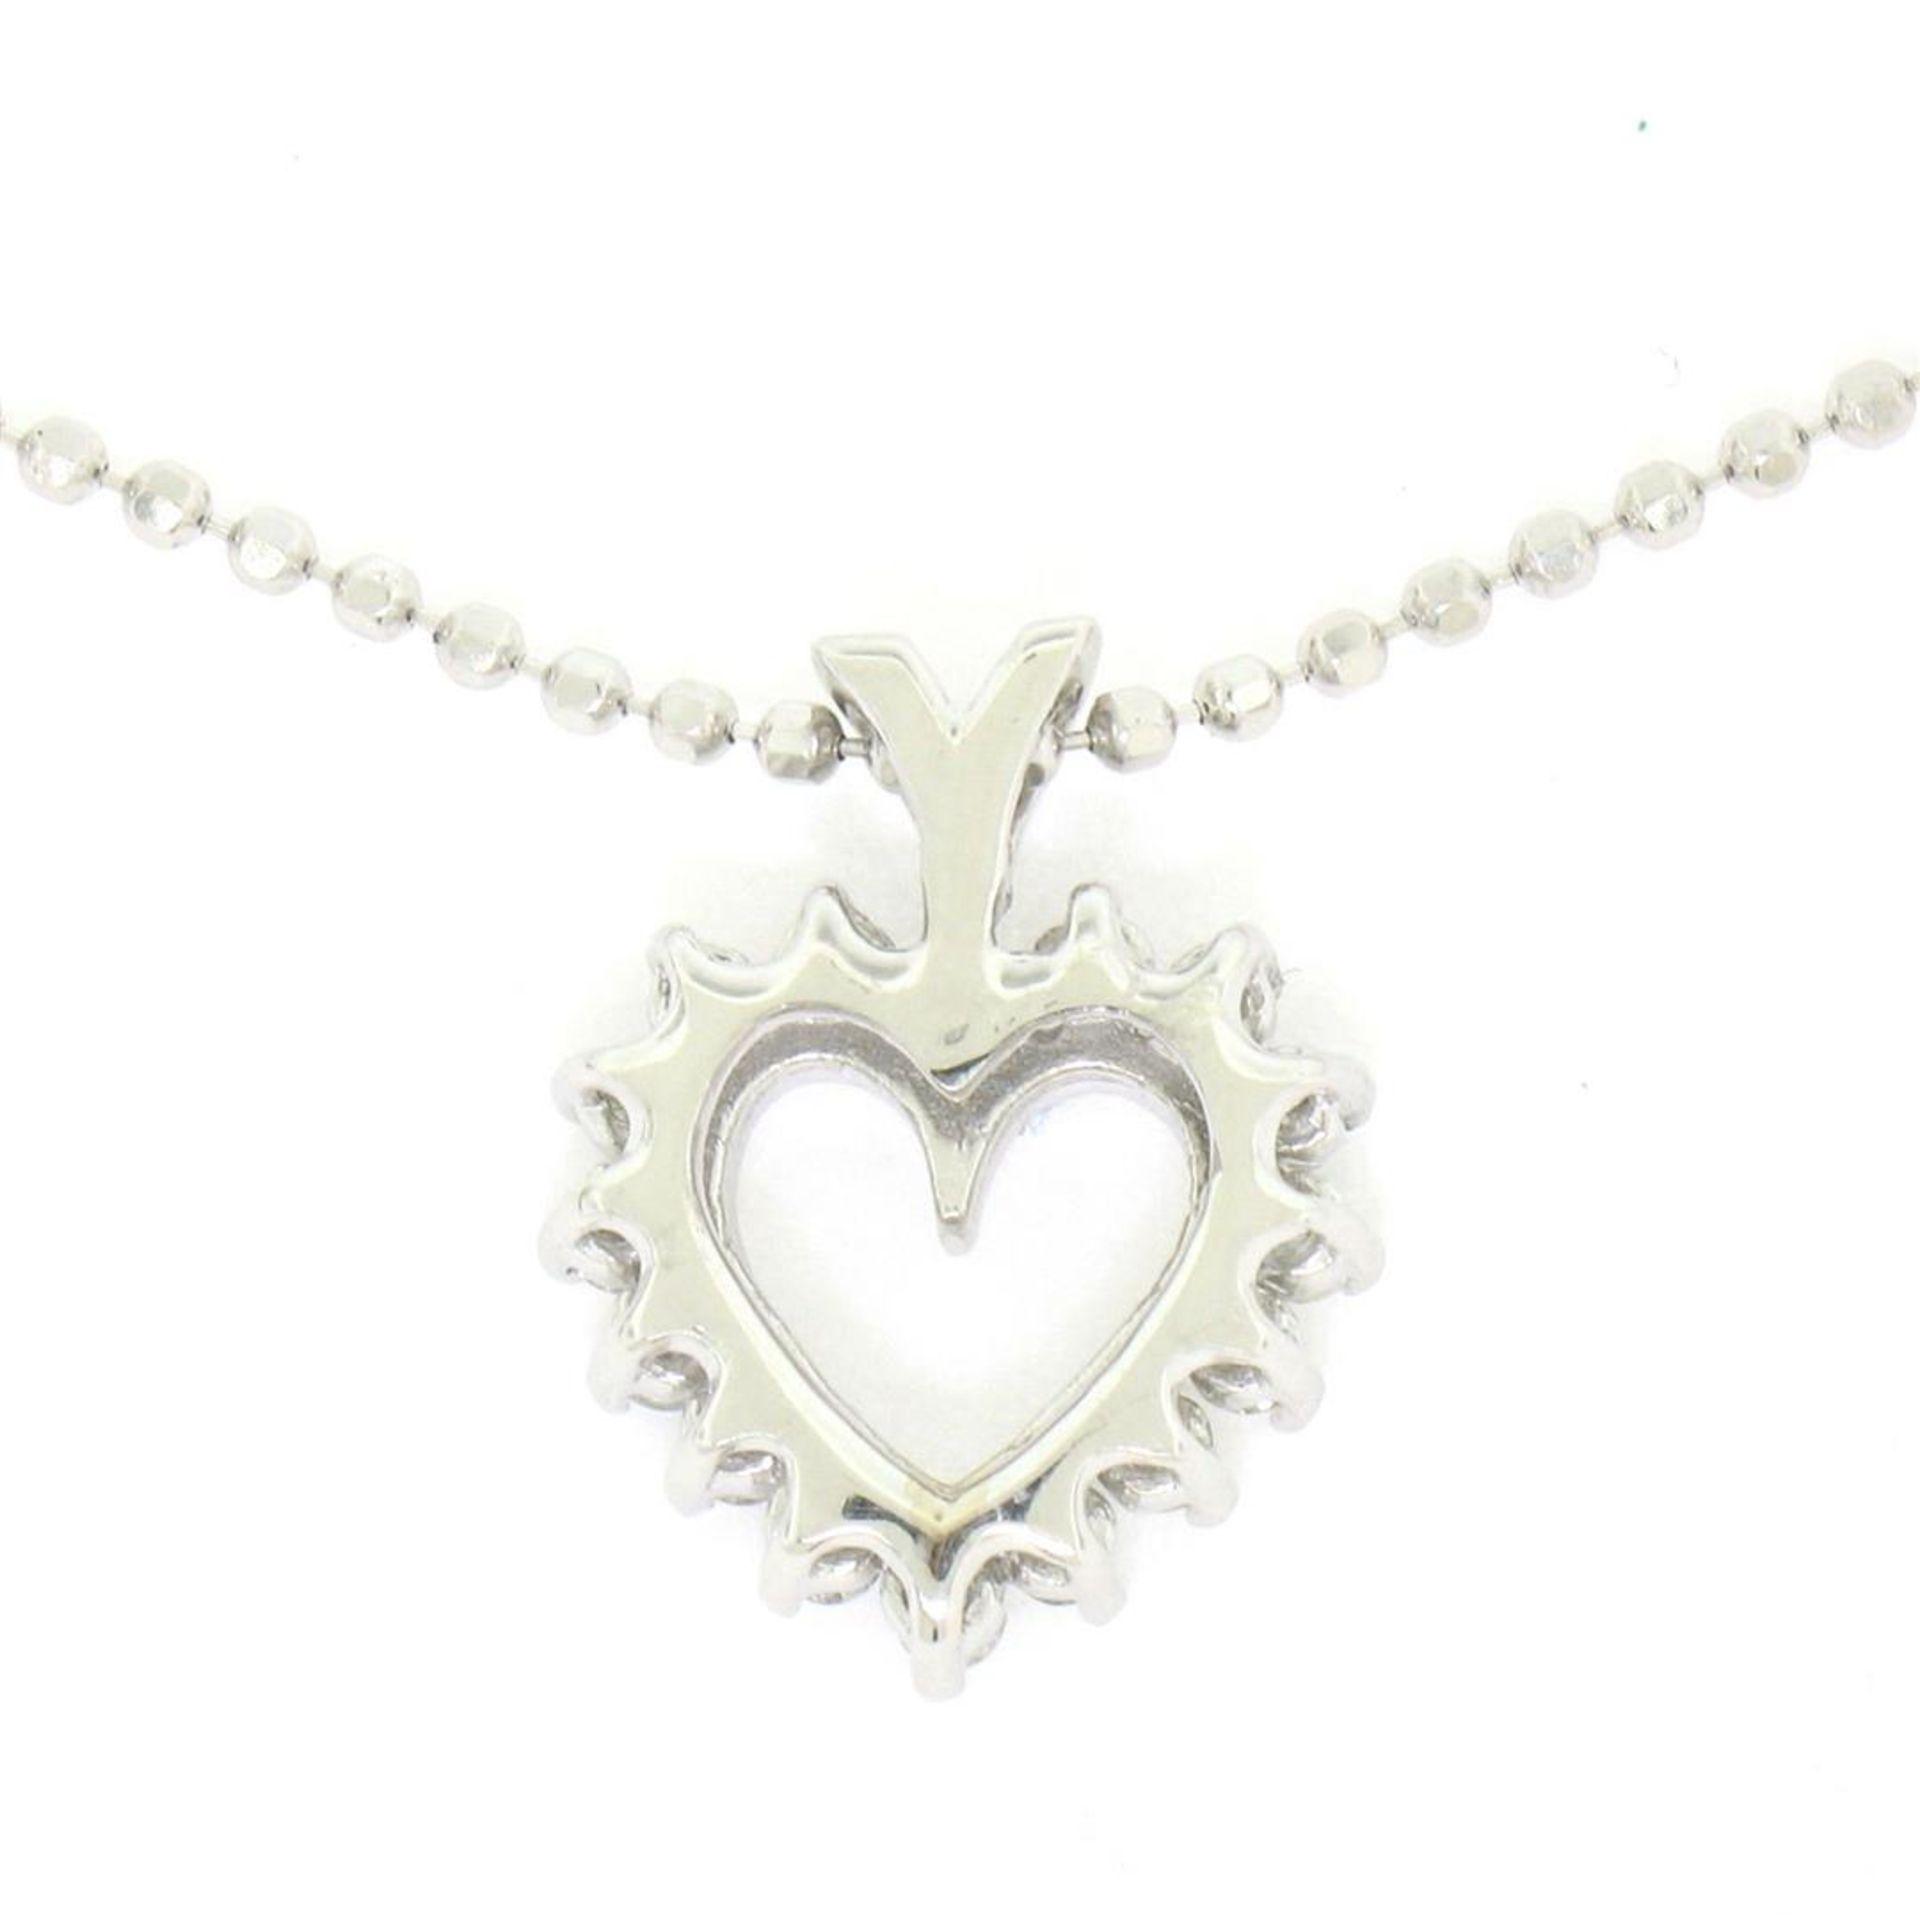 "14k White Gold 0.40 ctw Round Brilliant Diamond Open Heart Pendant 18"" Bead Chai - Image 5 of 7"